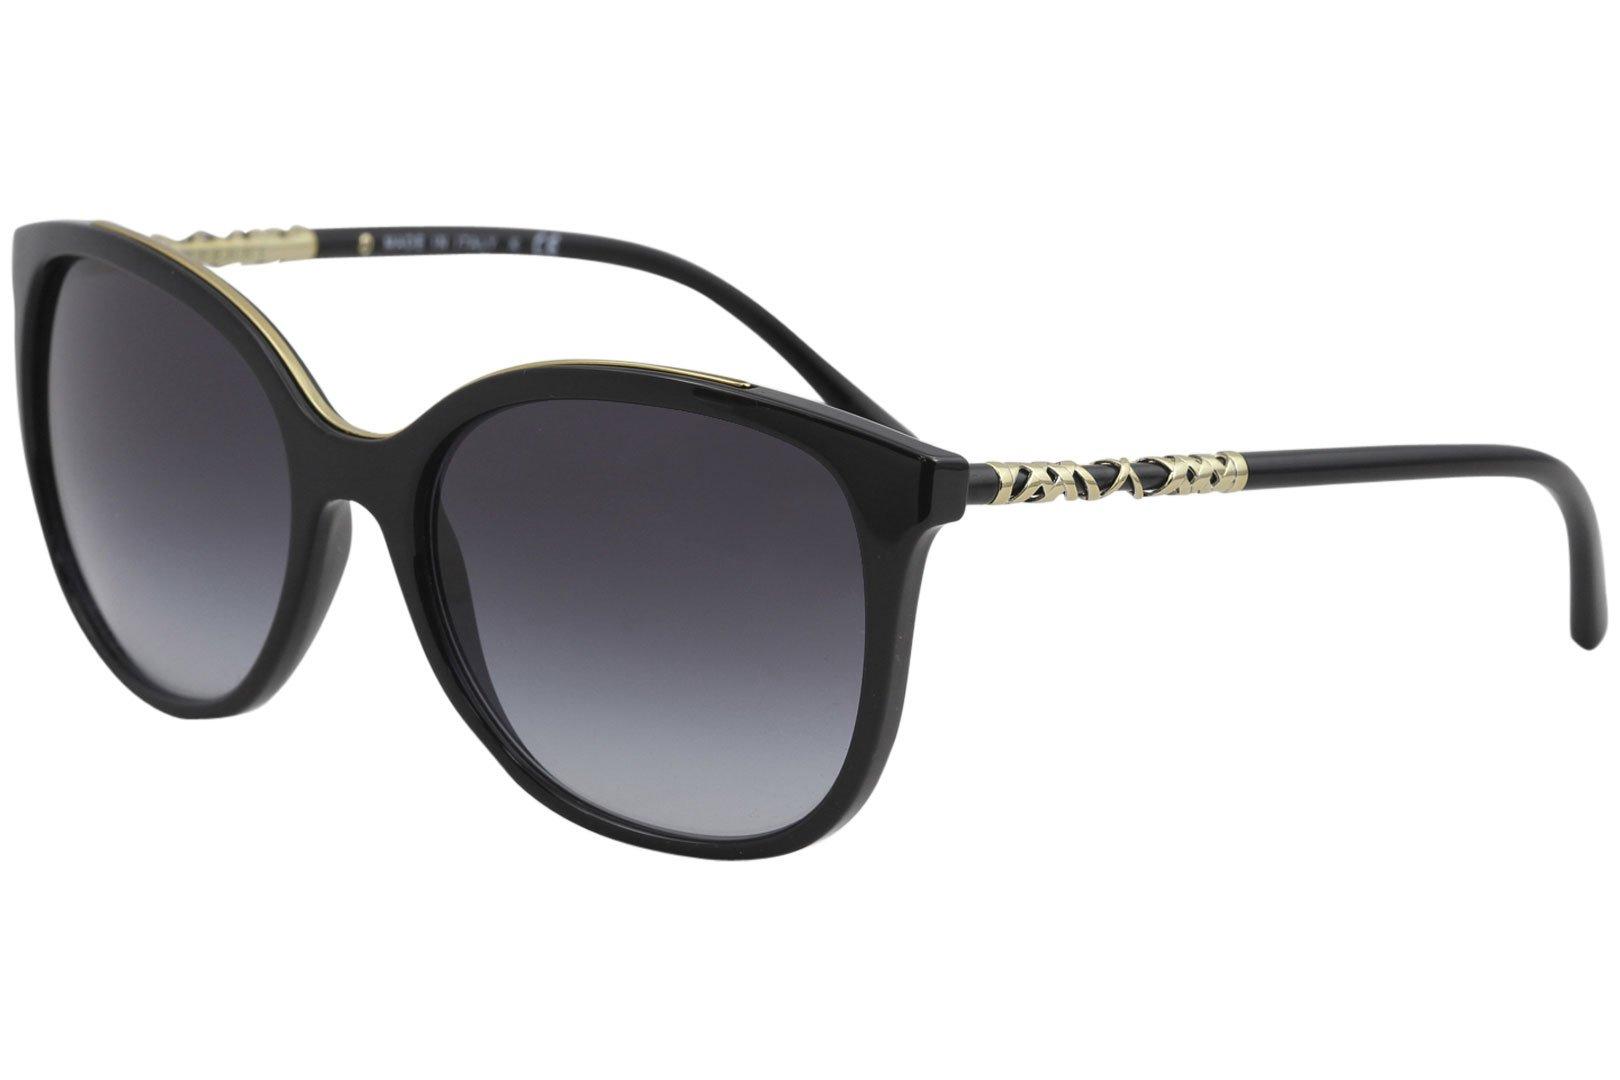 Burberry Women's 0BE4237 Black/Gray Gradient Sunglasses